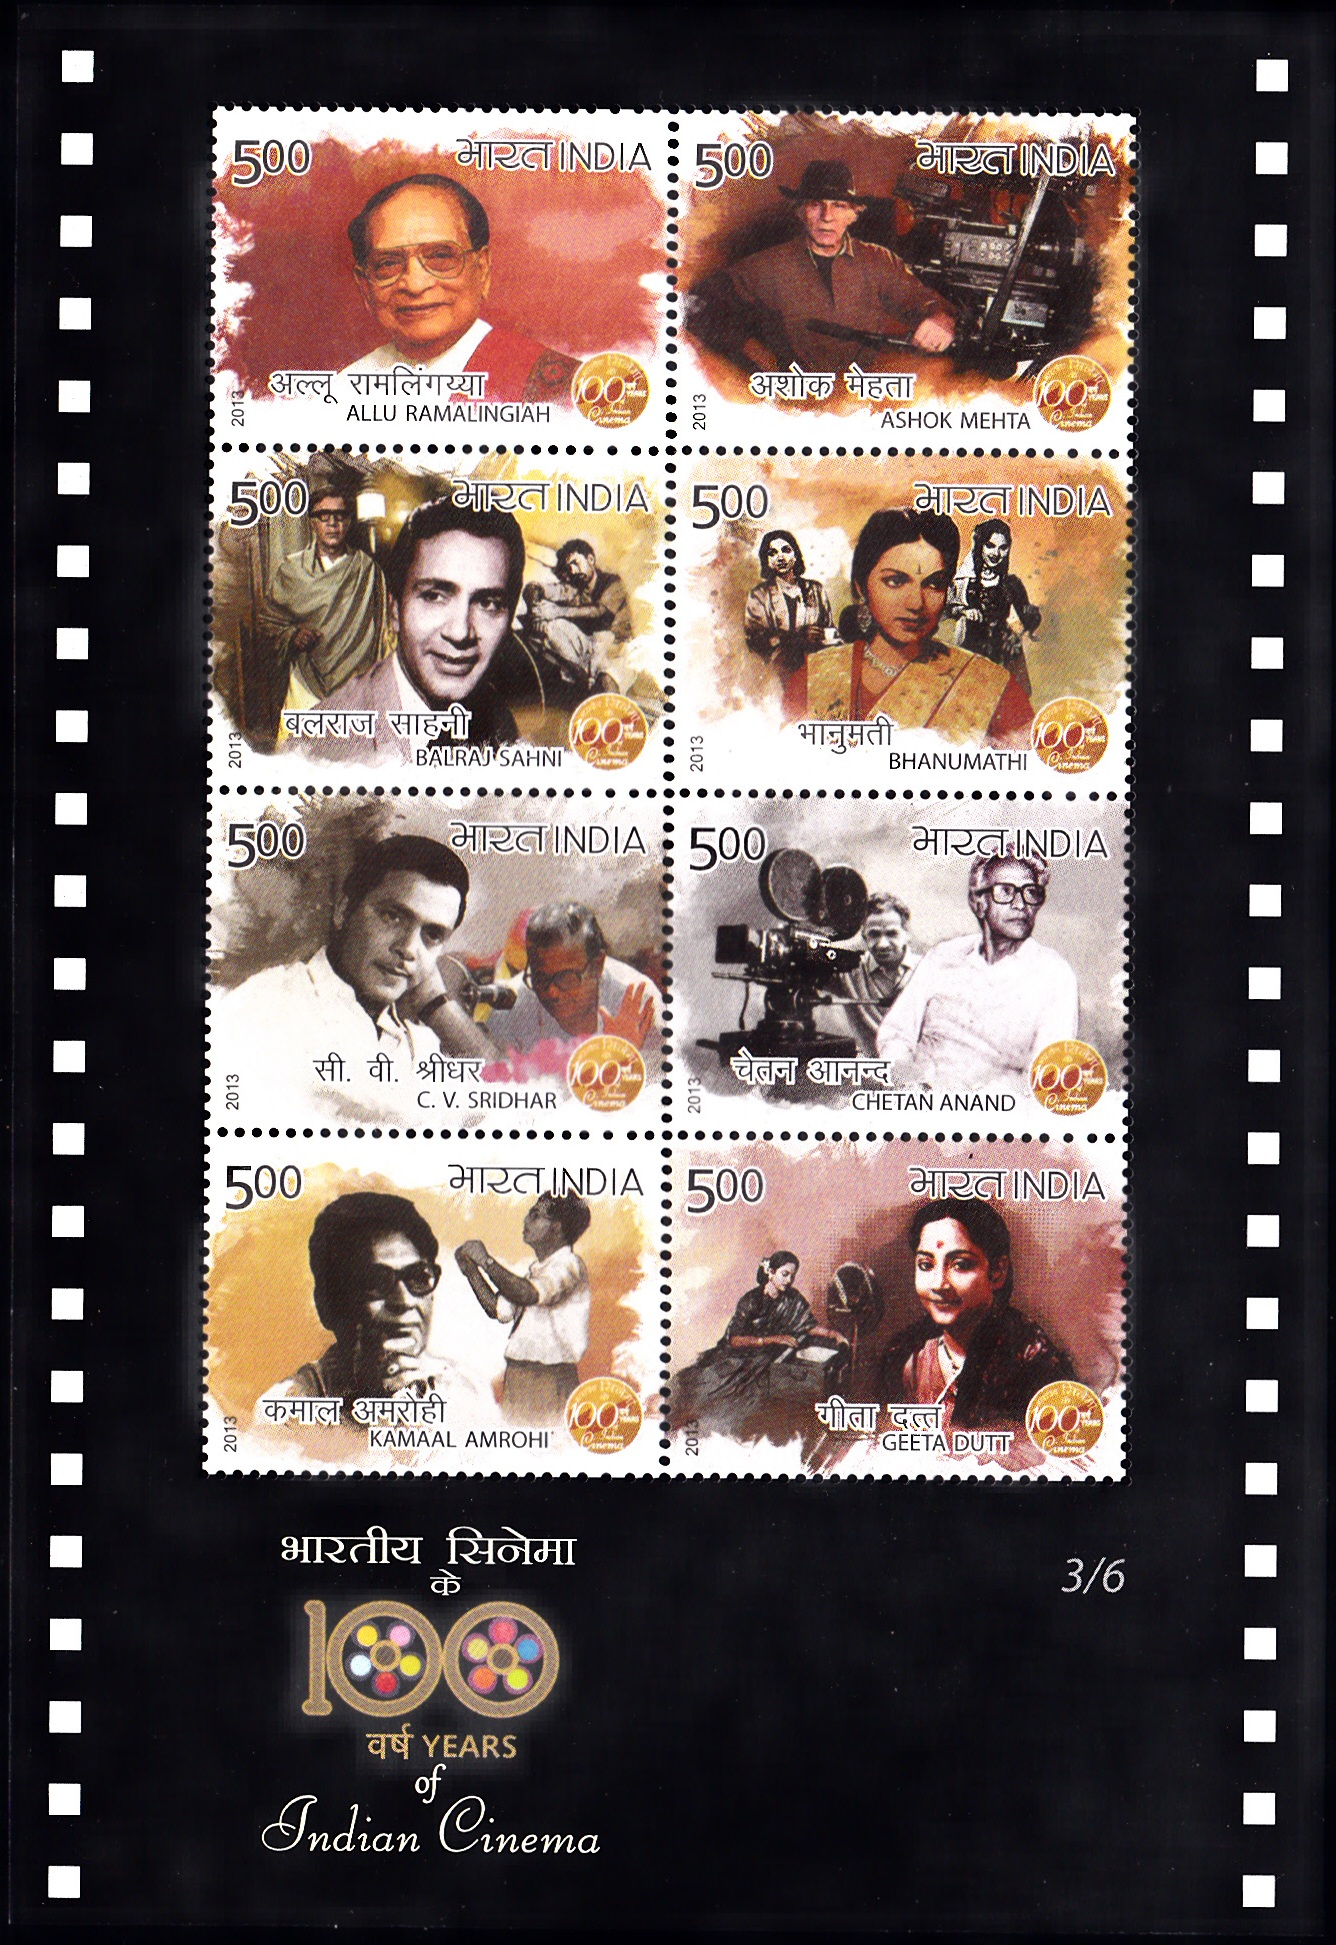 Indian Cinema Centenary : Miniature Sheet 3